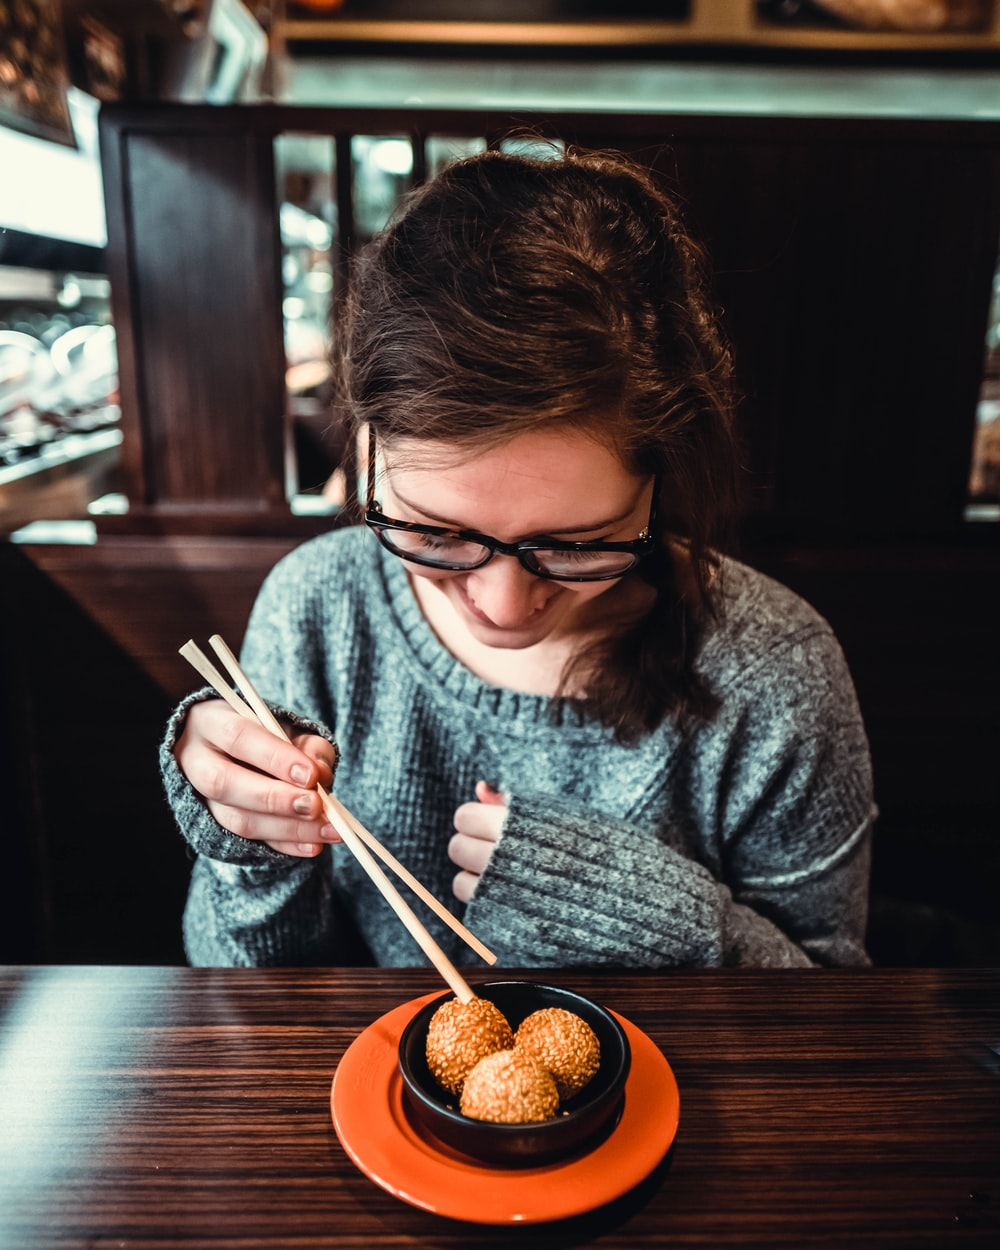 woman smiling while picking up food using chopstick